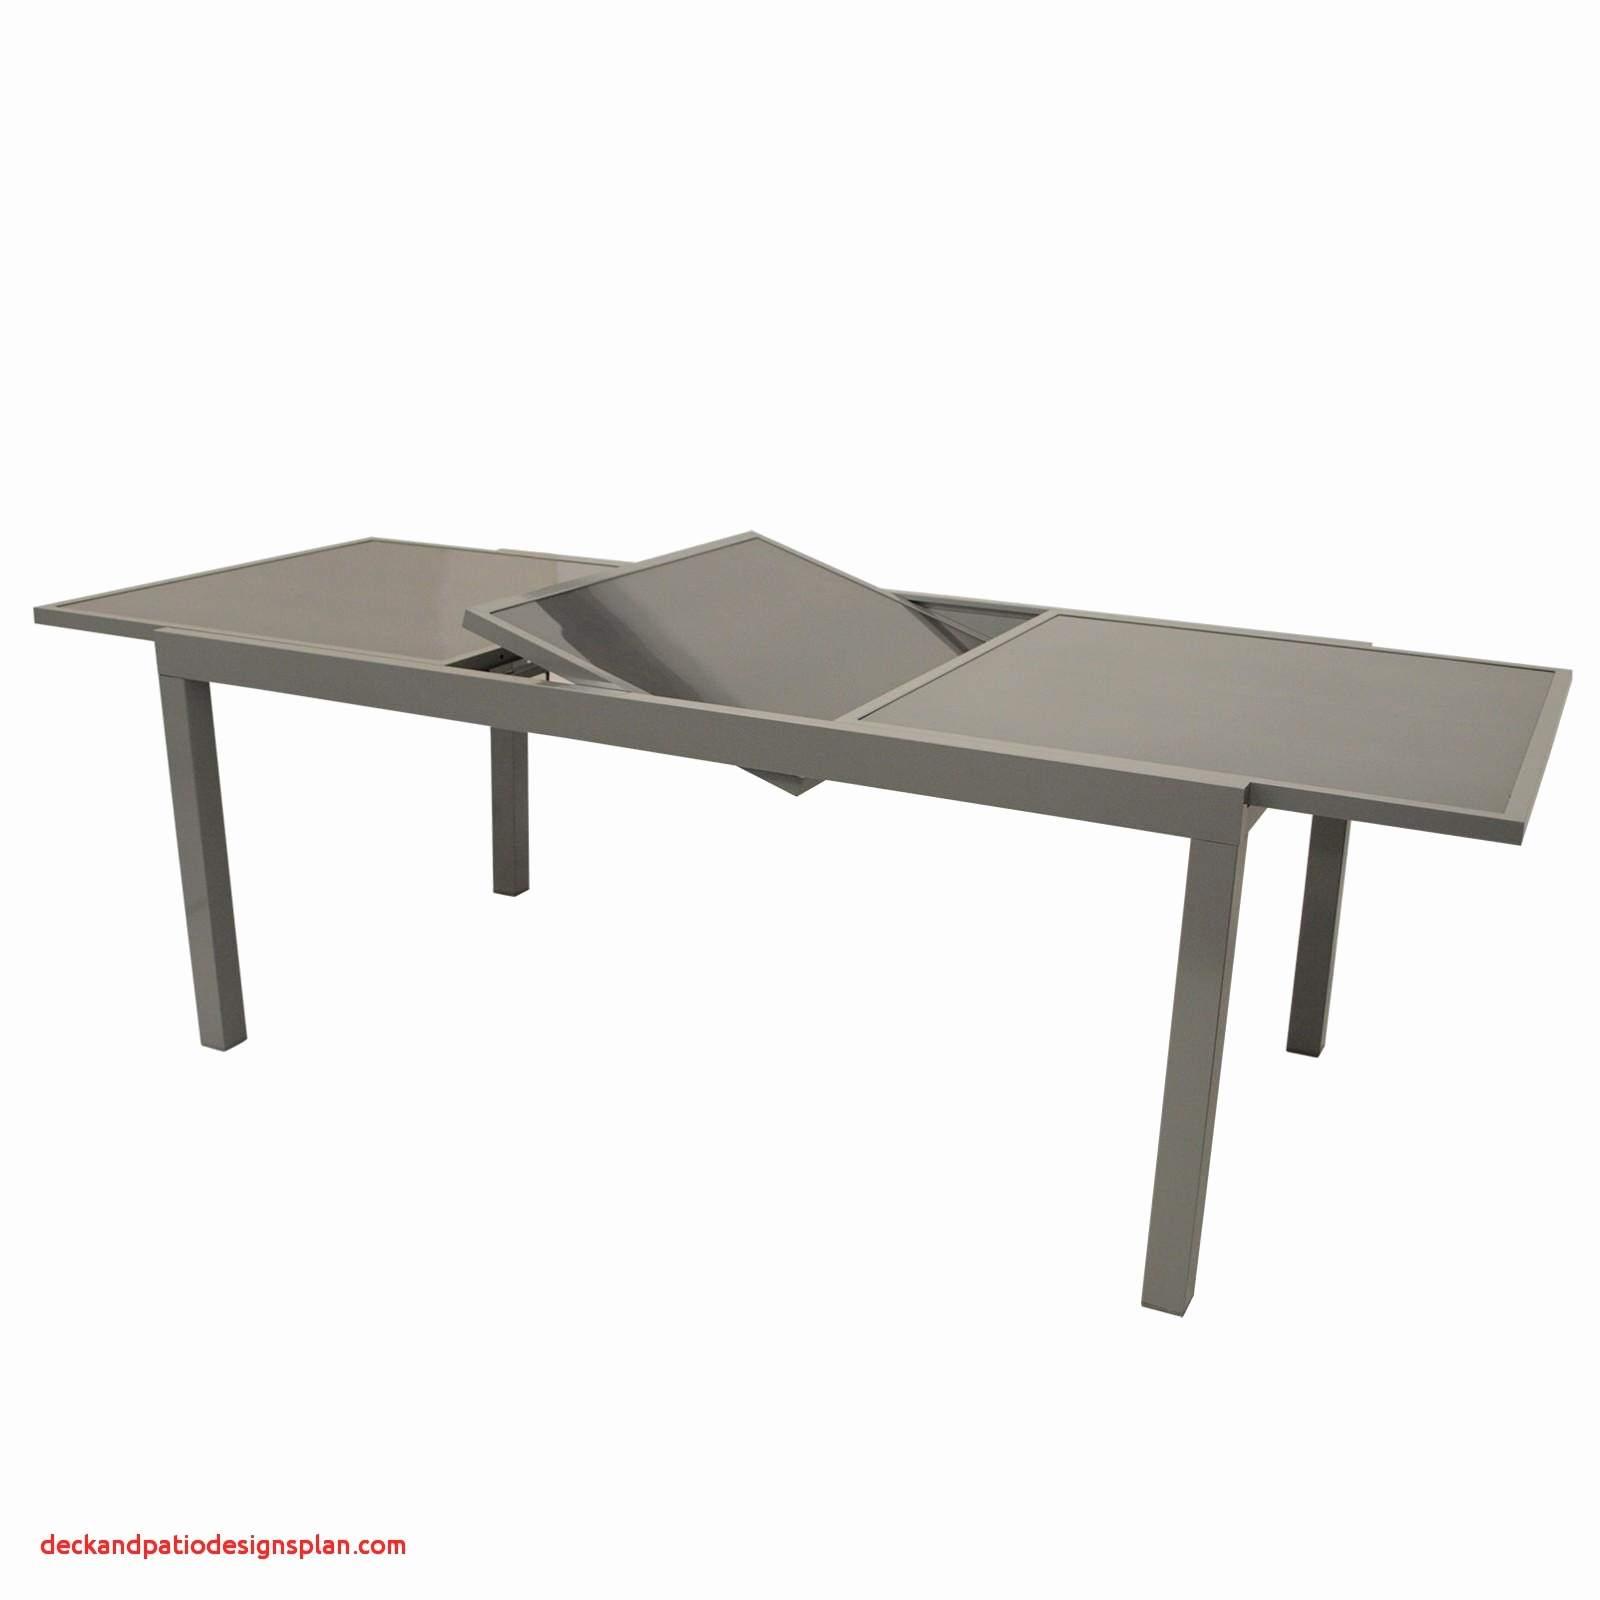 Table Kettler solde Beau Image 15 Impressionnant Salon De Jardin Kettler Galerie De Cuisine